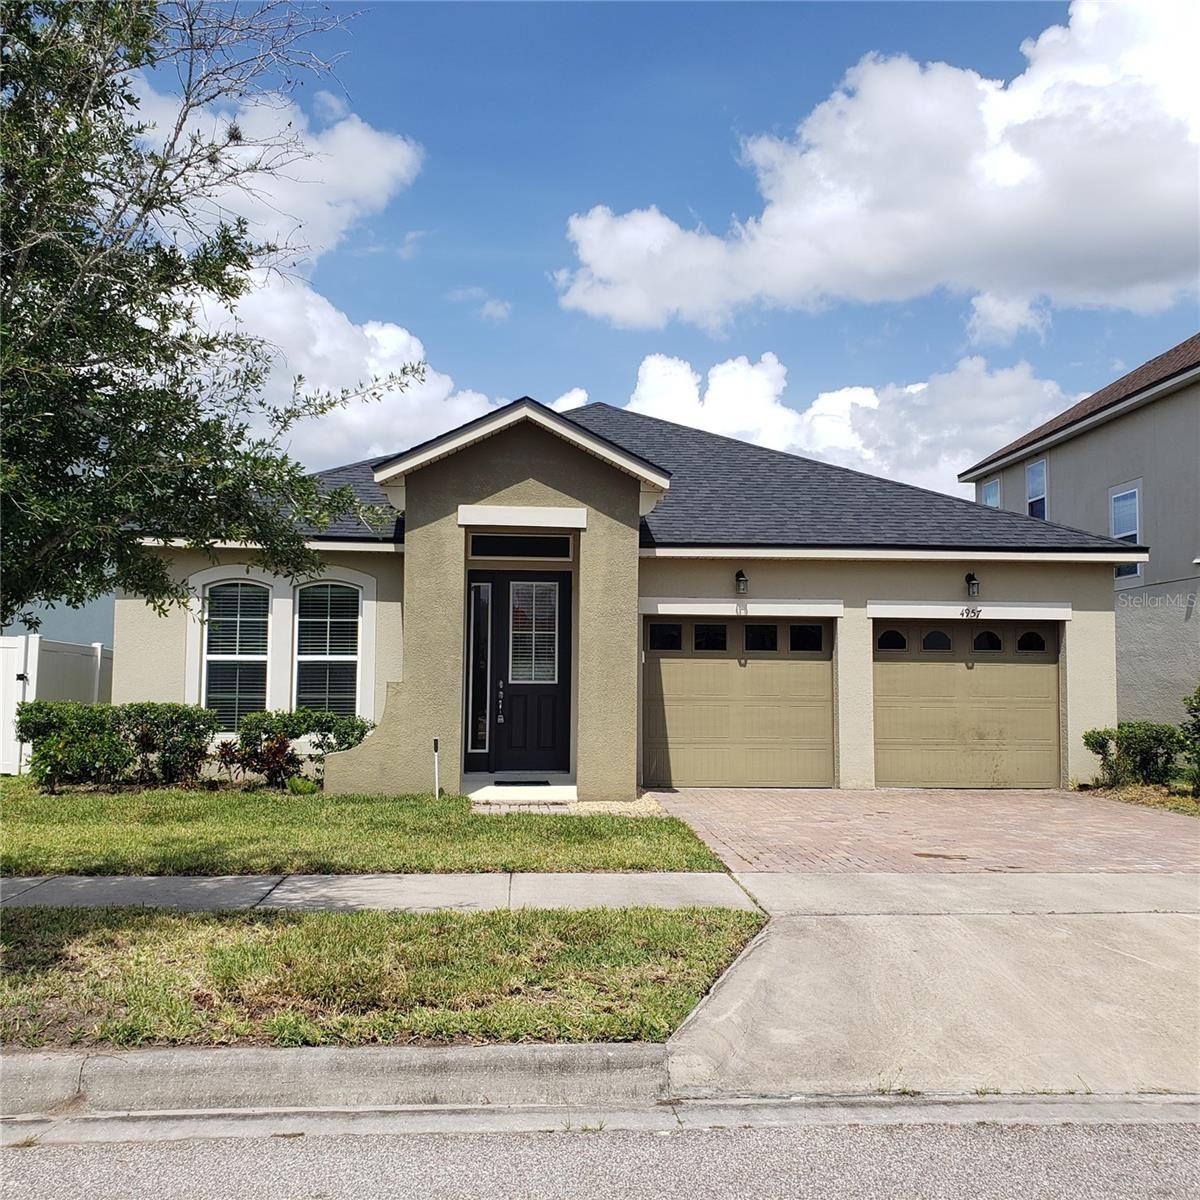 4957 SOUTHLAWN AVENUE, Orlando, FL 32811 - #: O5952344